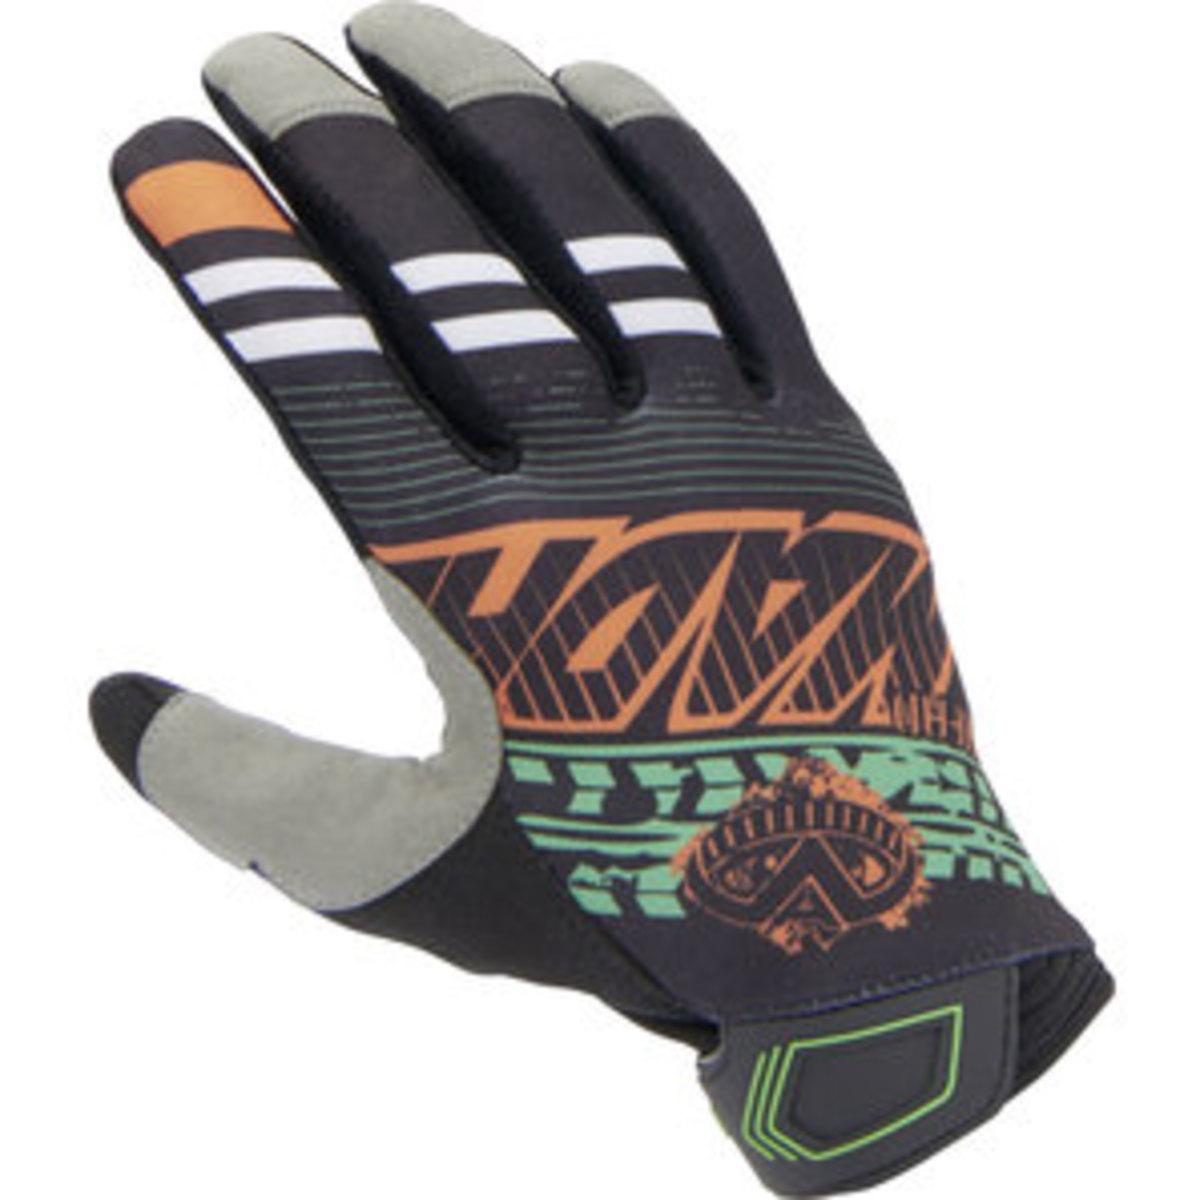 Bild 2 von Madhead 5V Handschuhe